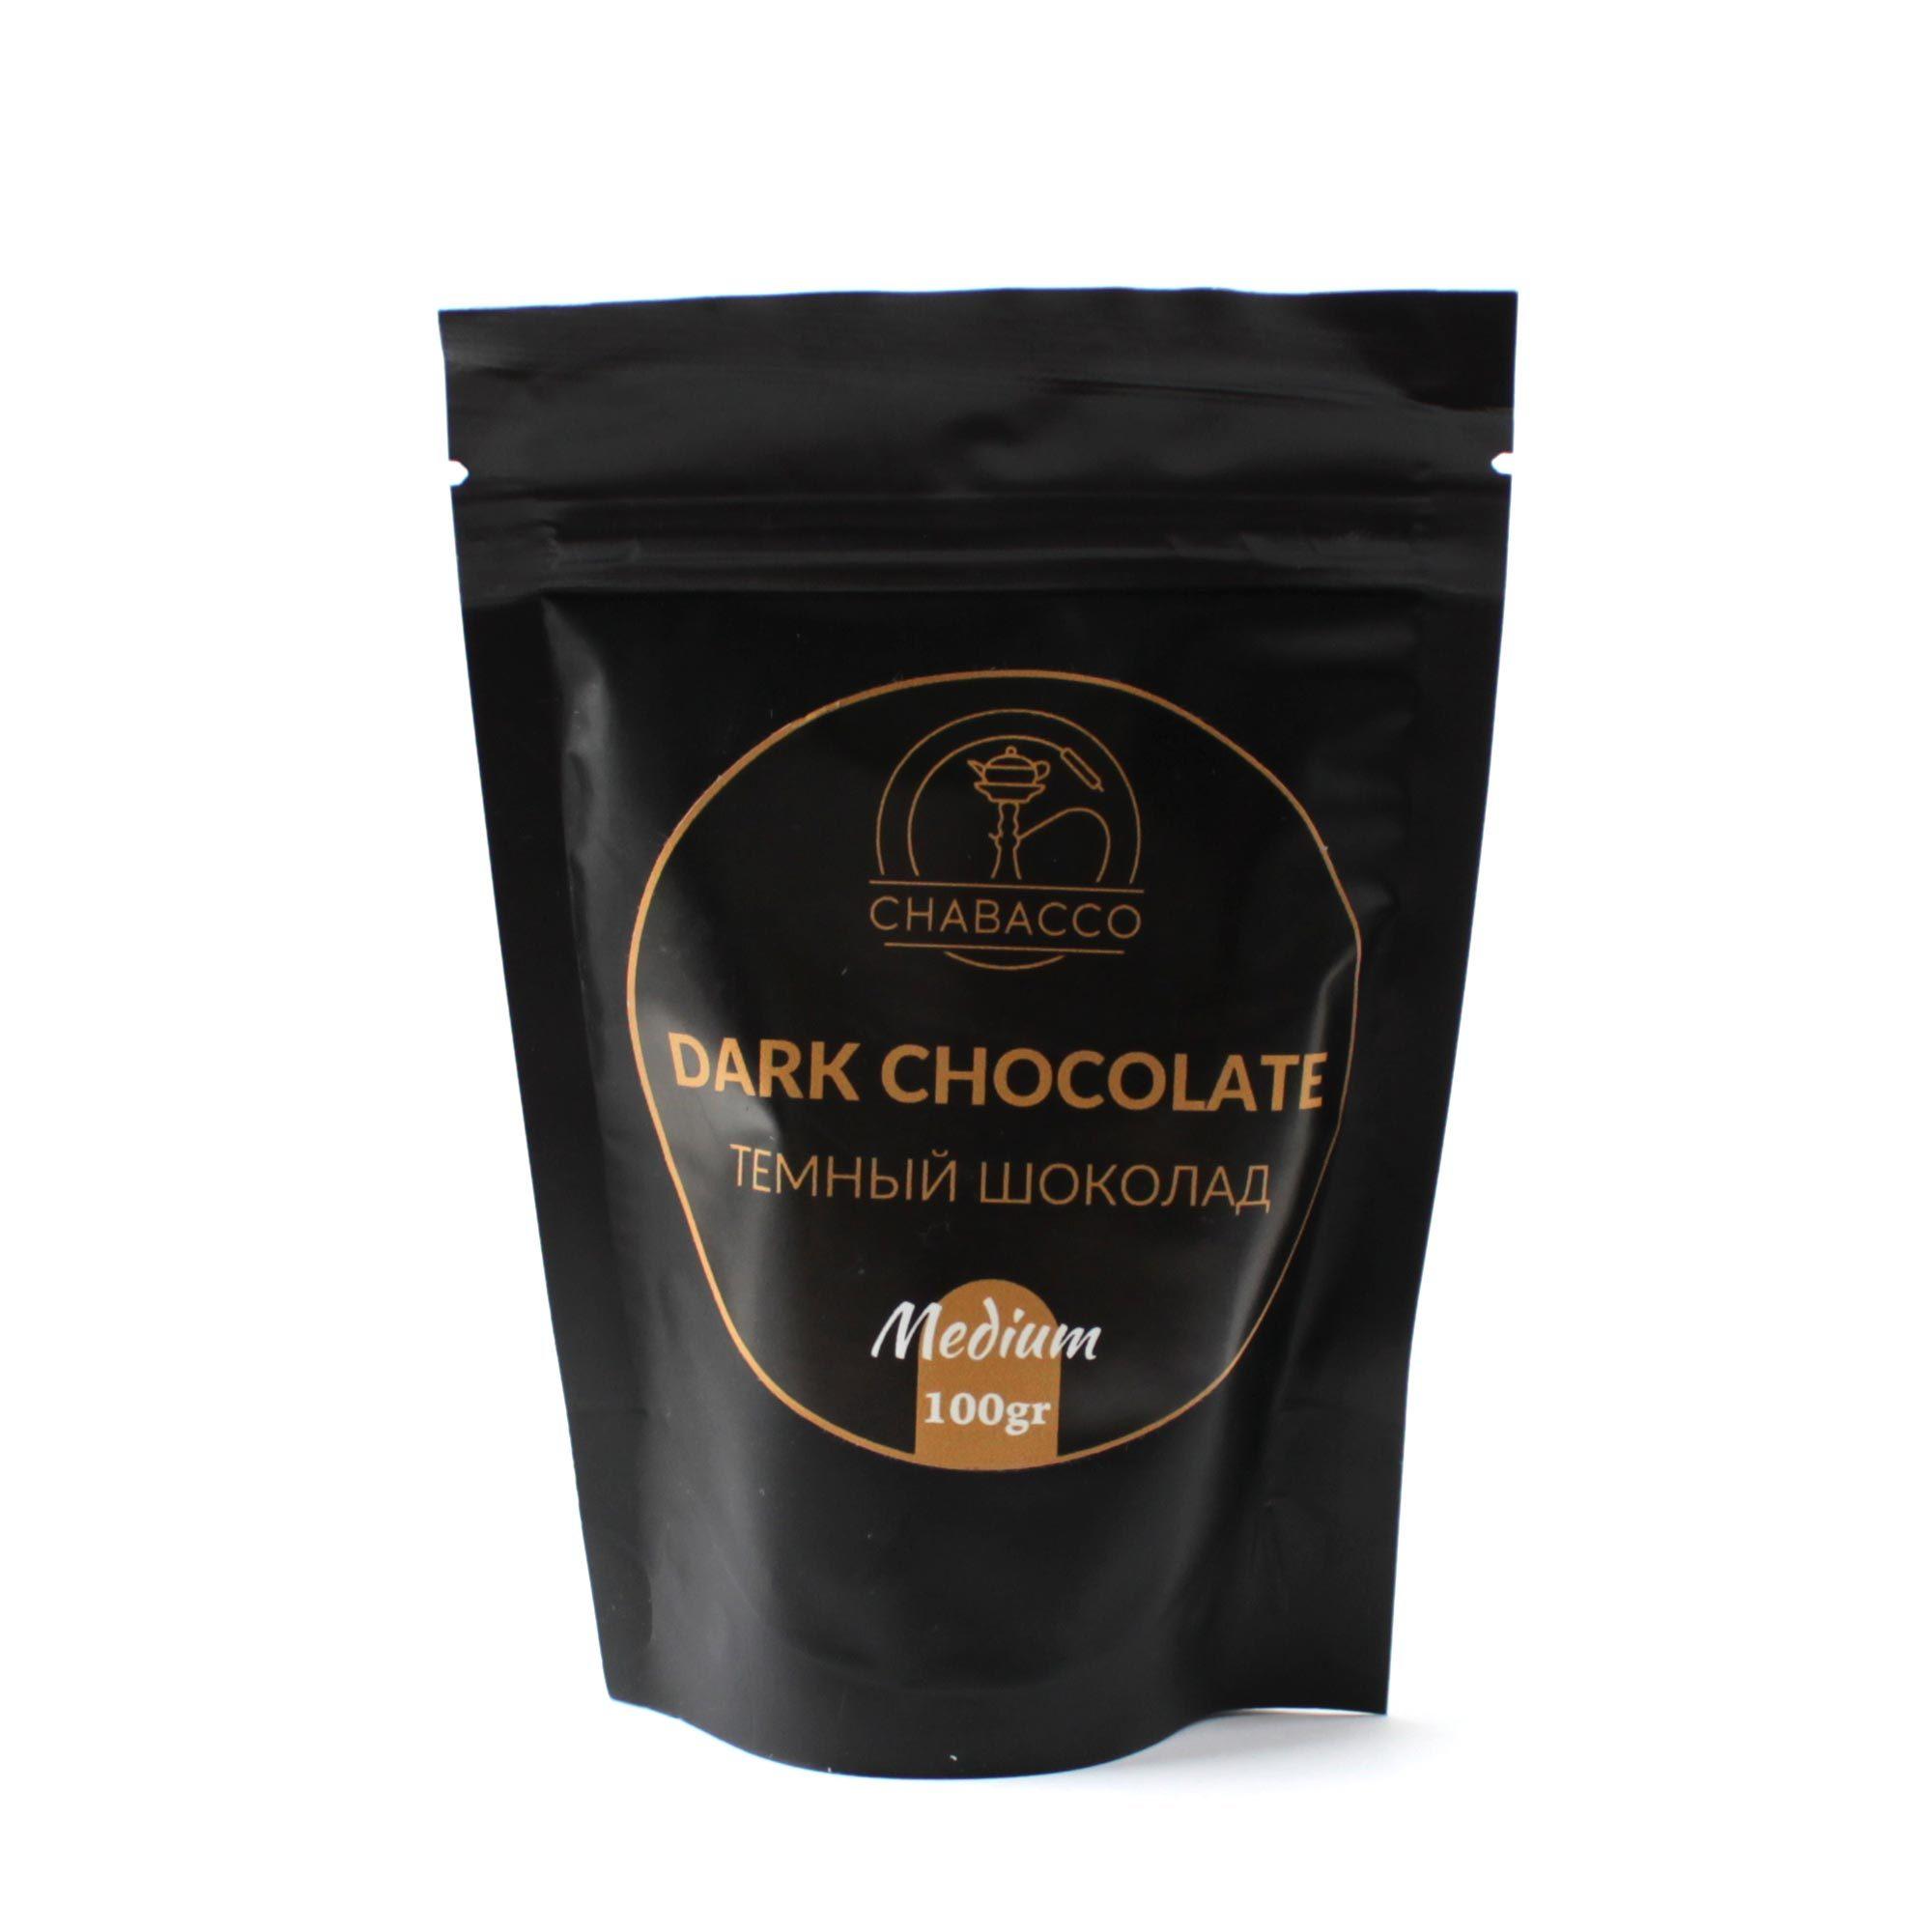 Кальянная смесь Chabacco Medium 100 гр Dark Chocolate